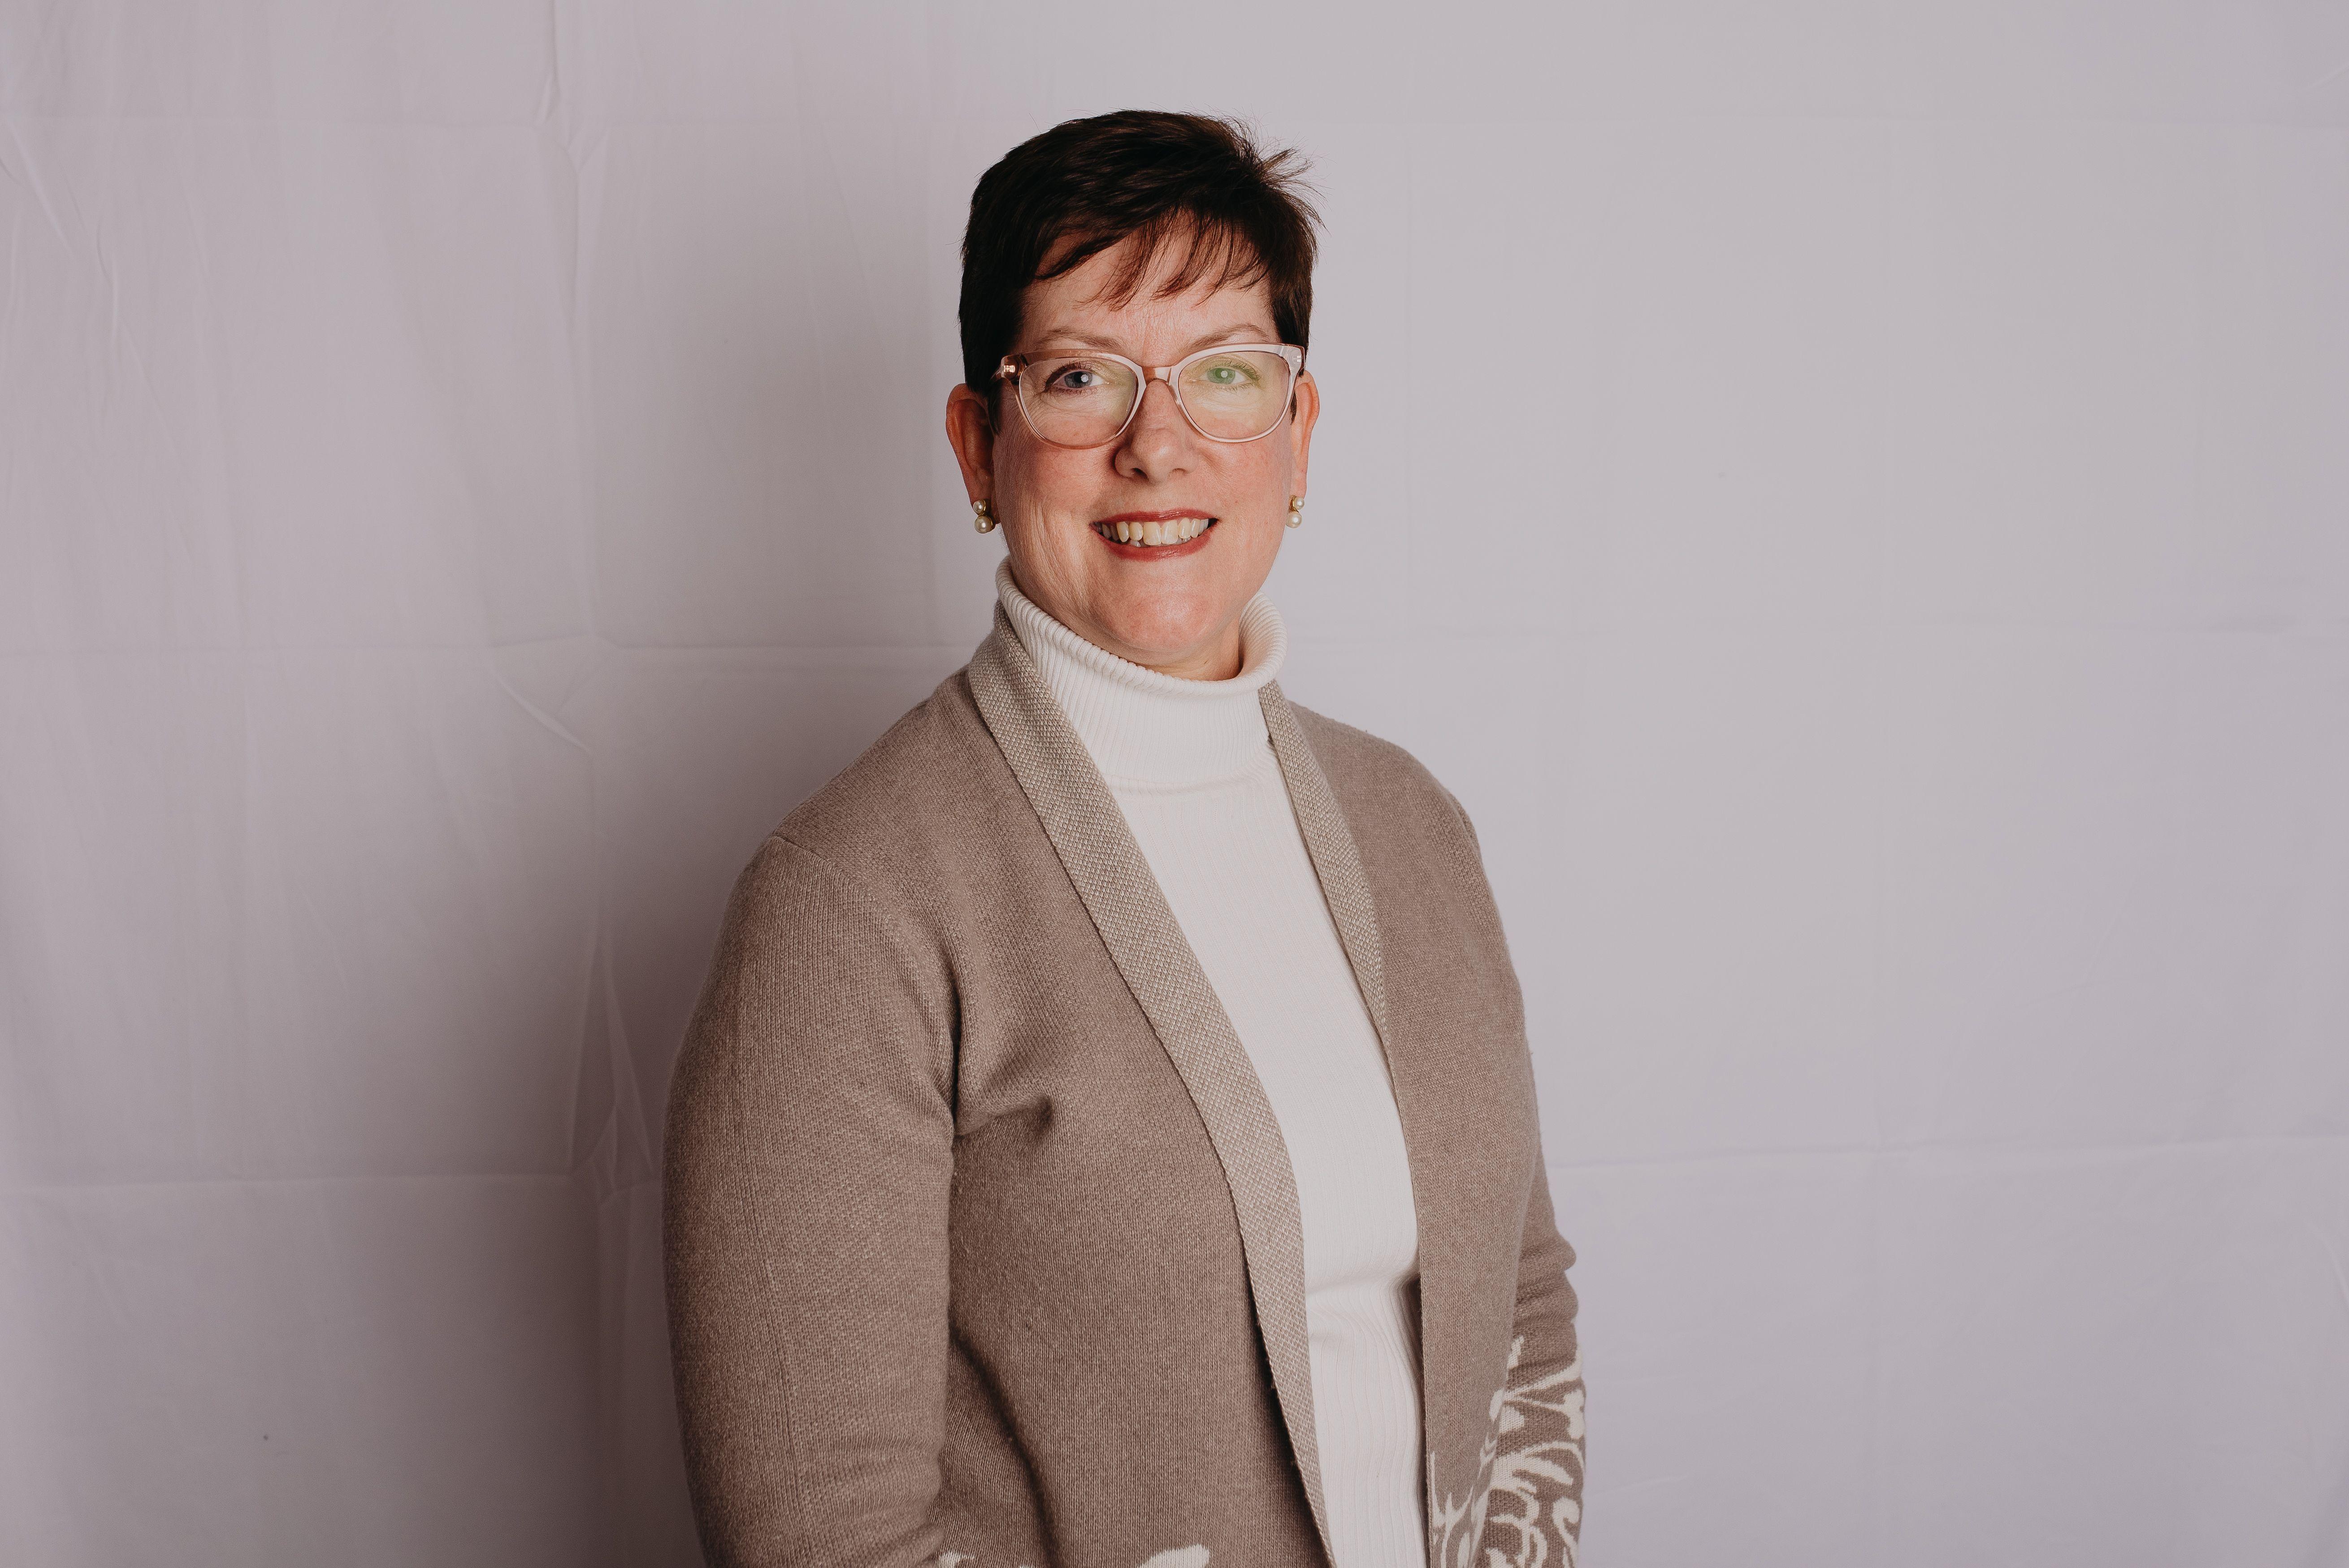 Kelly Ptacek, Foodbank for the Heartland